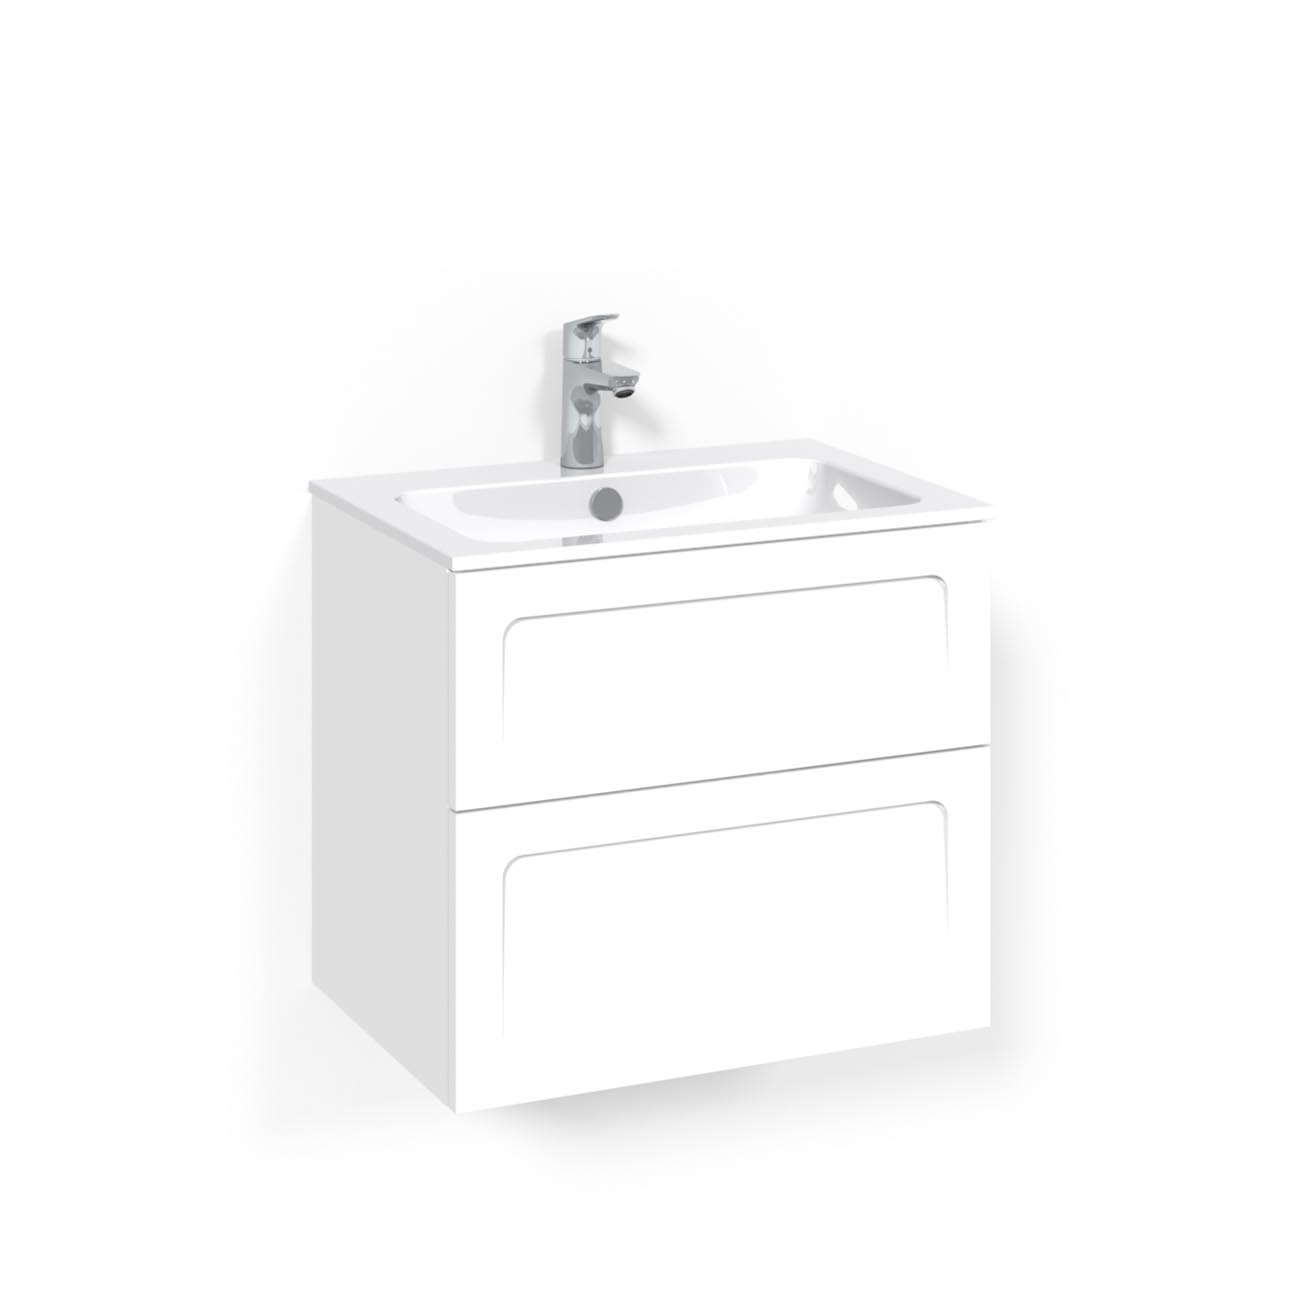 Tvättställsskåp Macro Design Crown Ramlucka Light 14